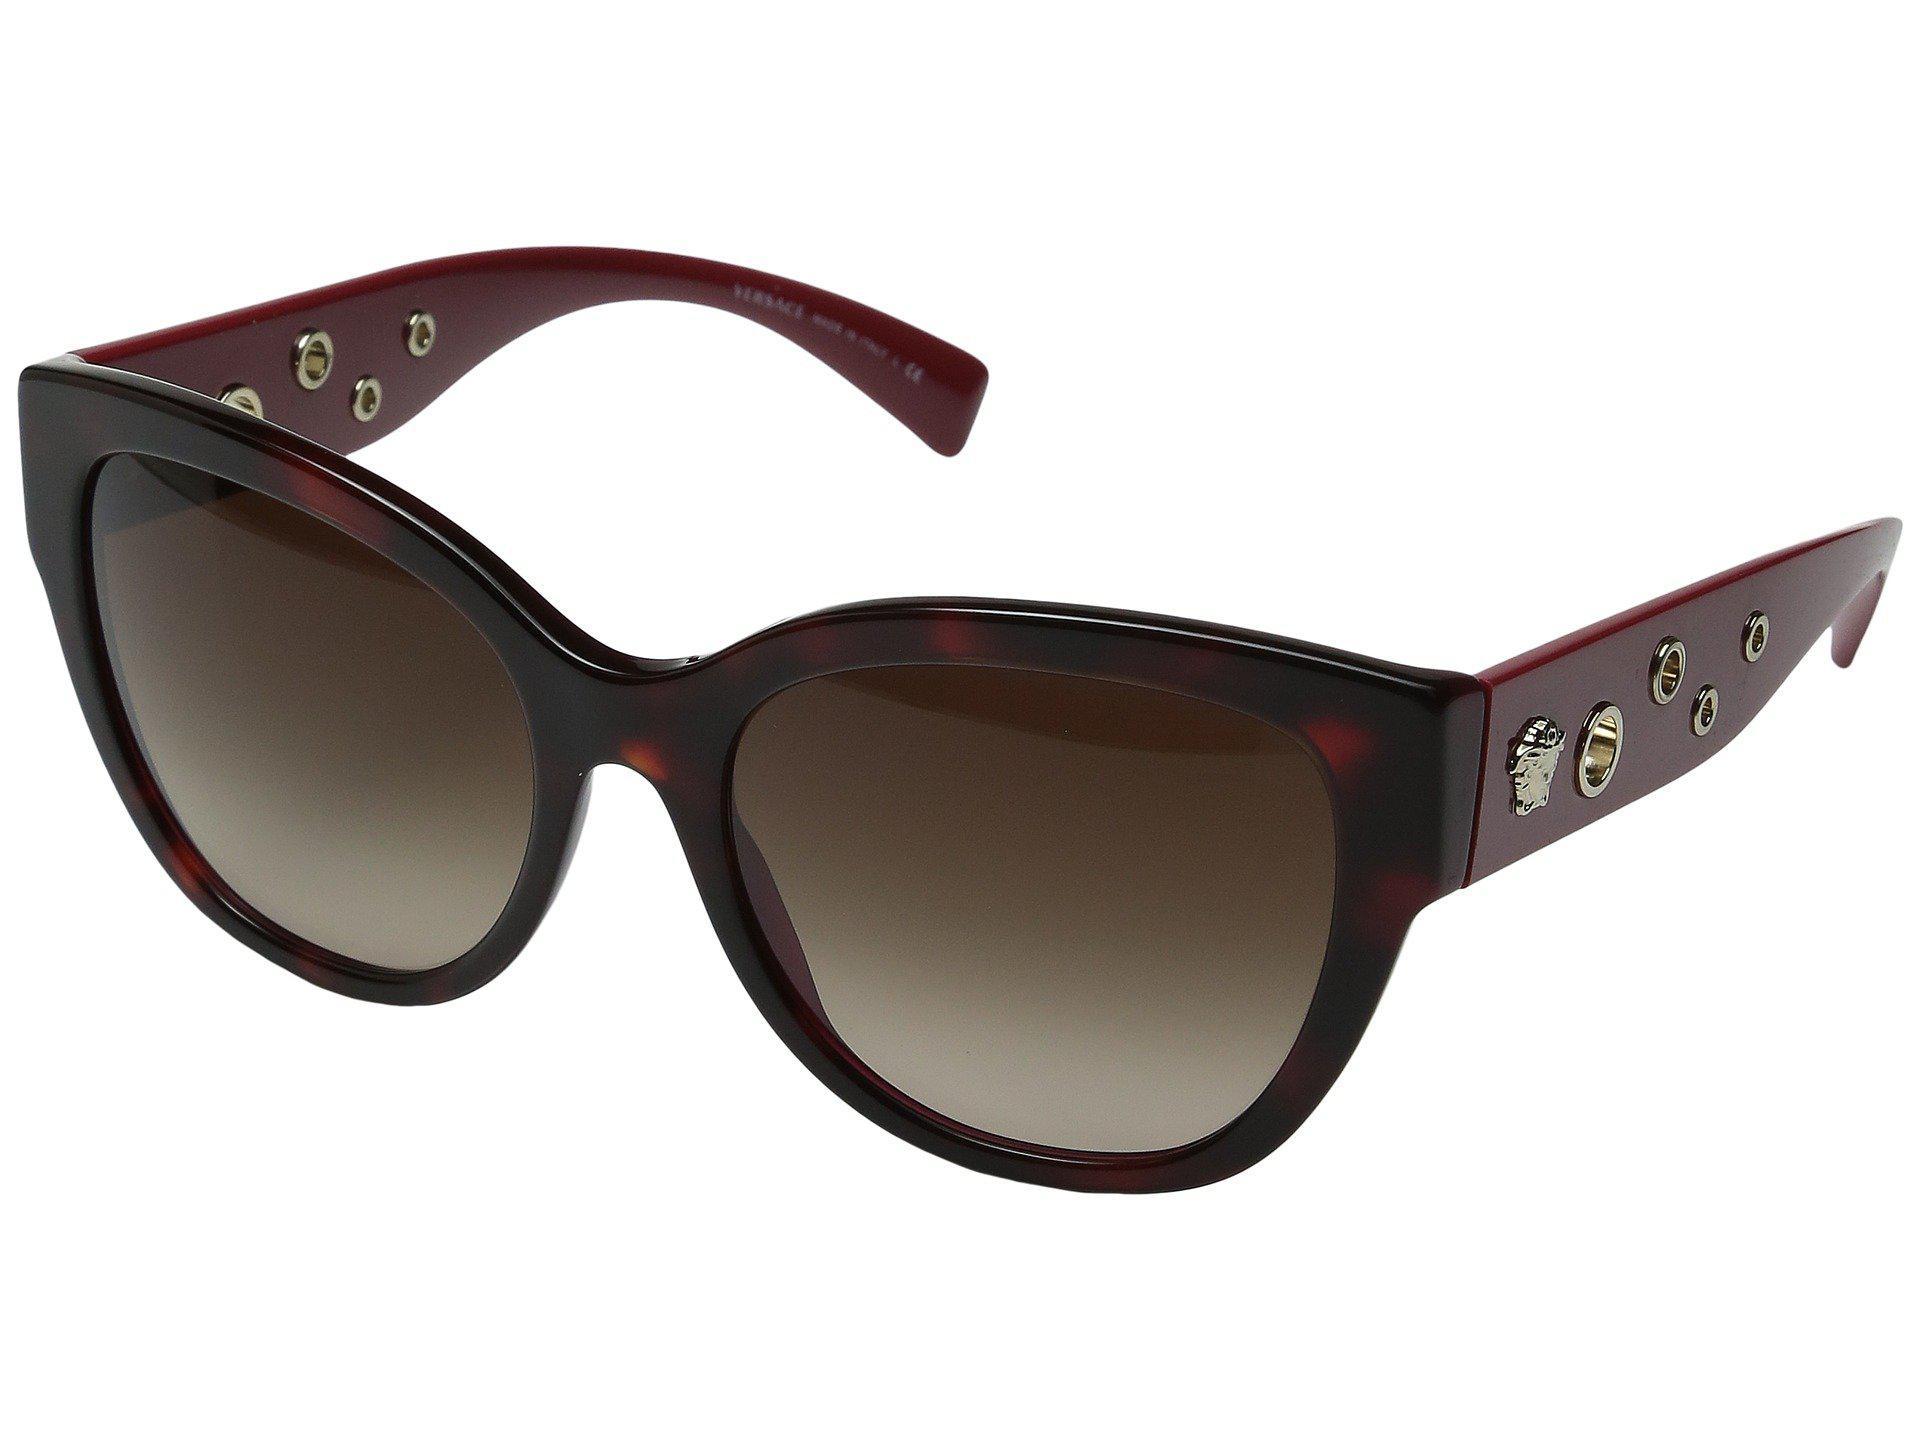 4a7ba2f388 Lyst - Versace Ve4314 in Brown